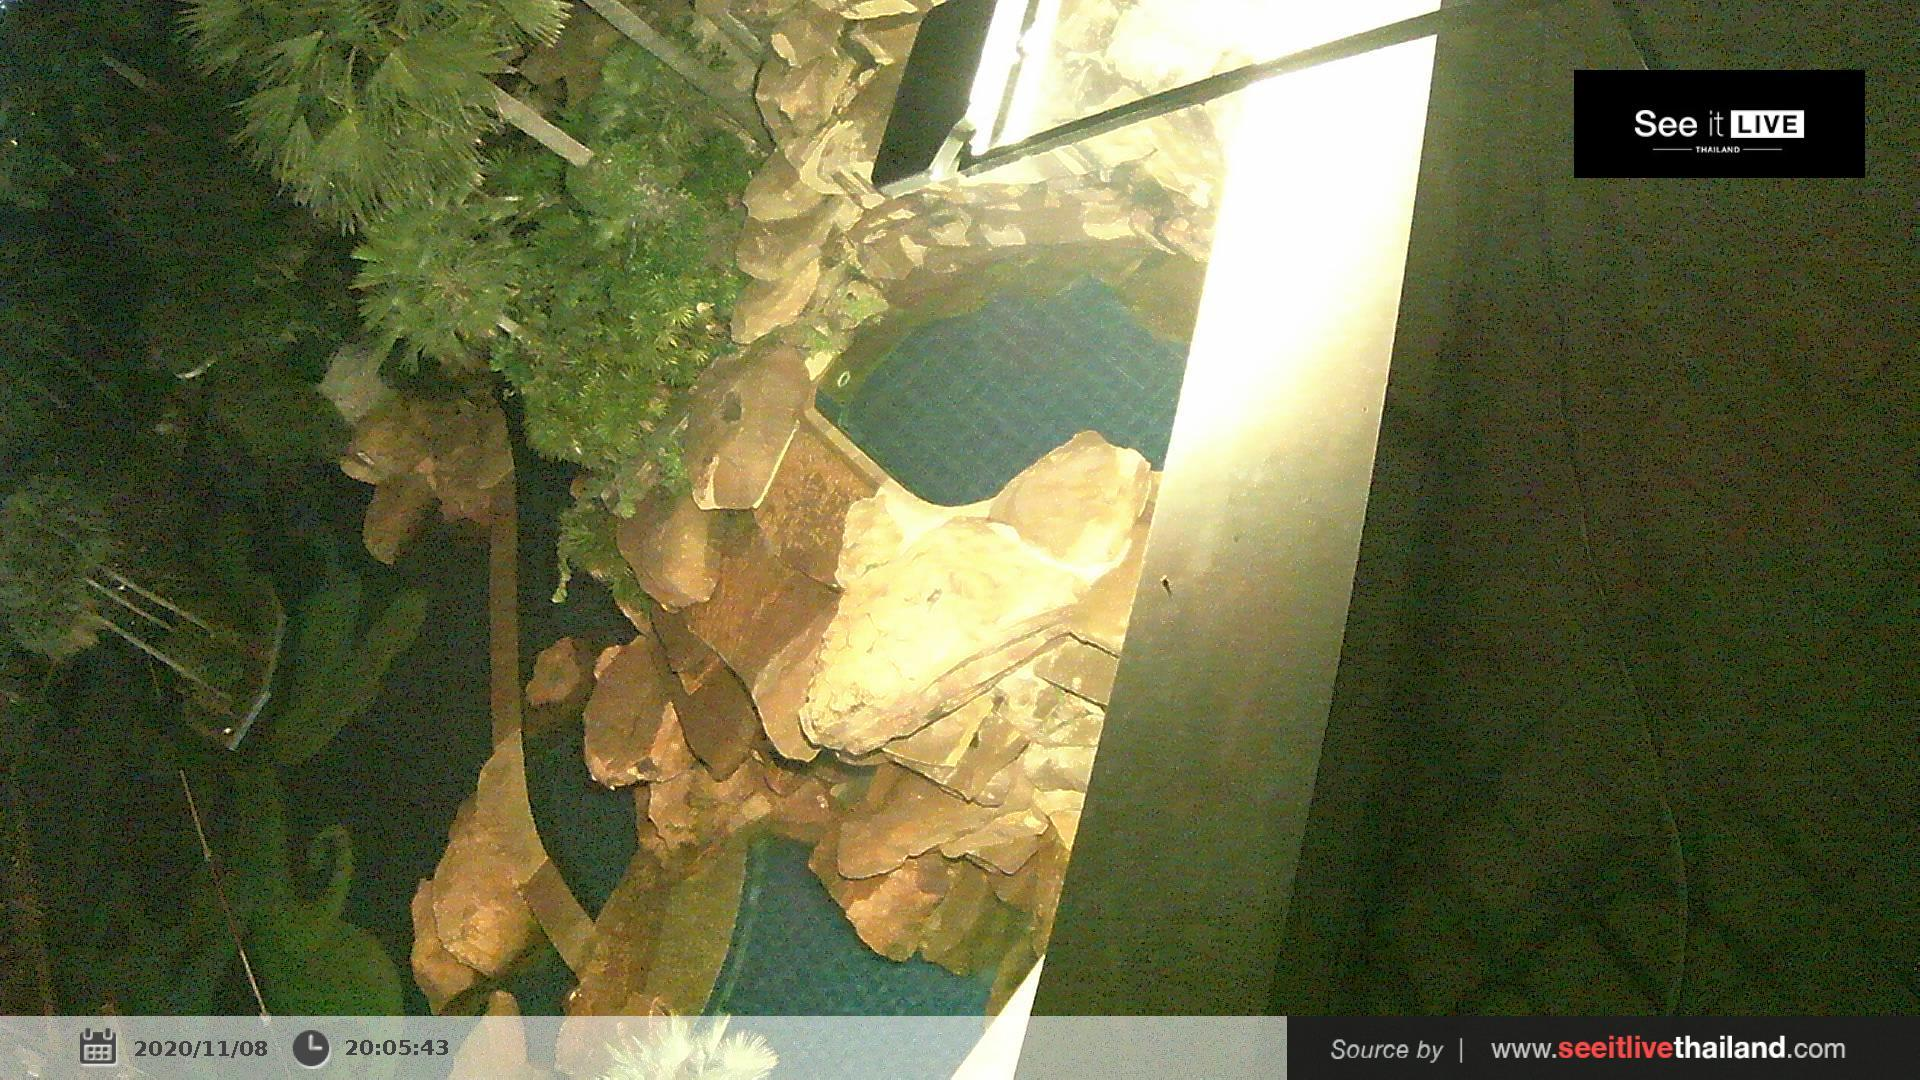 Webcam บ้านหนองสมอ: The Zign − Pattaya Naklua